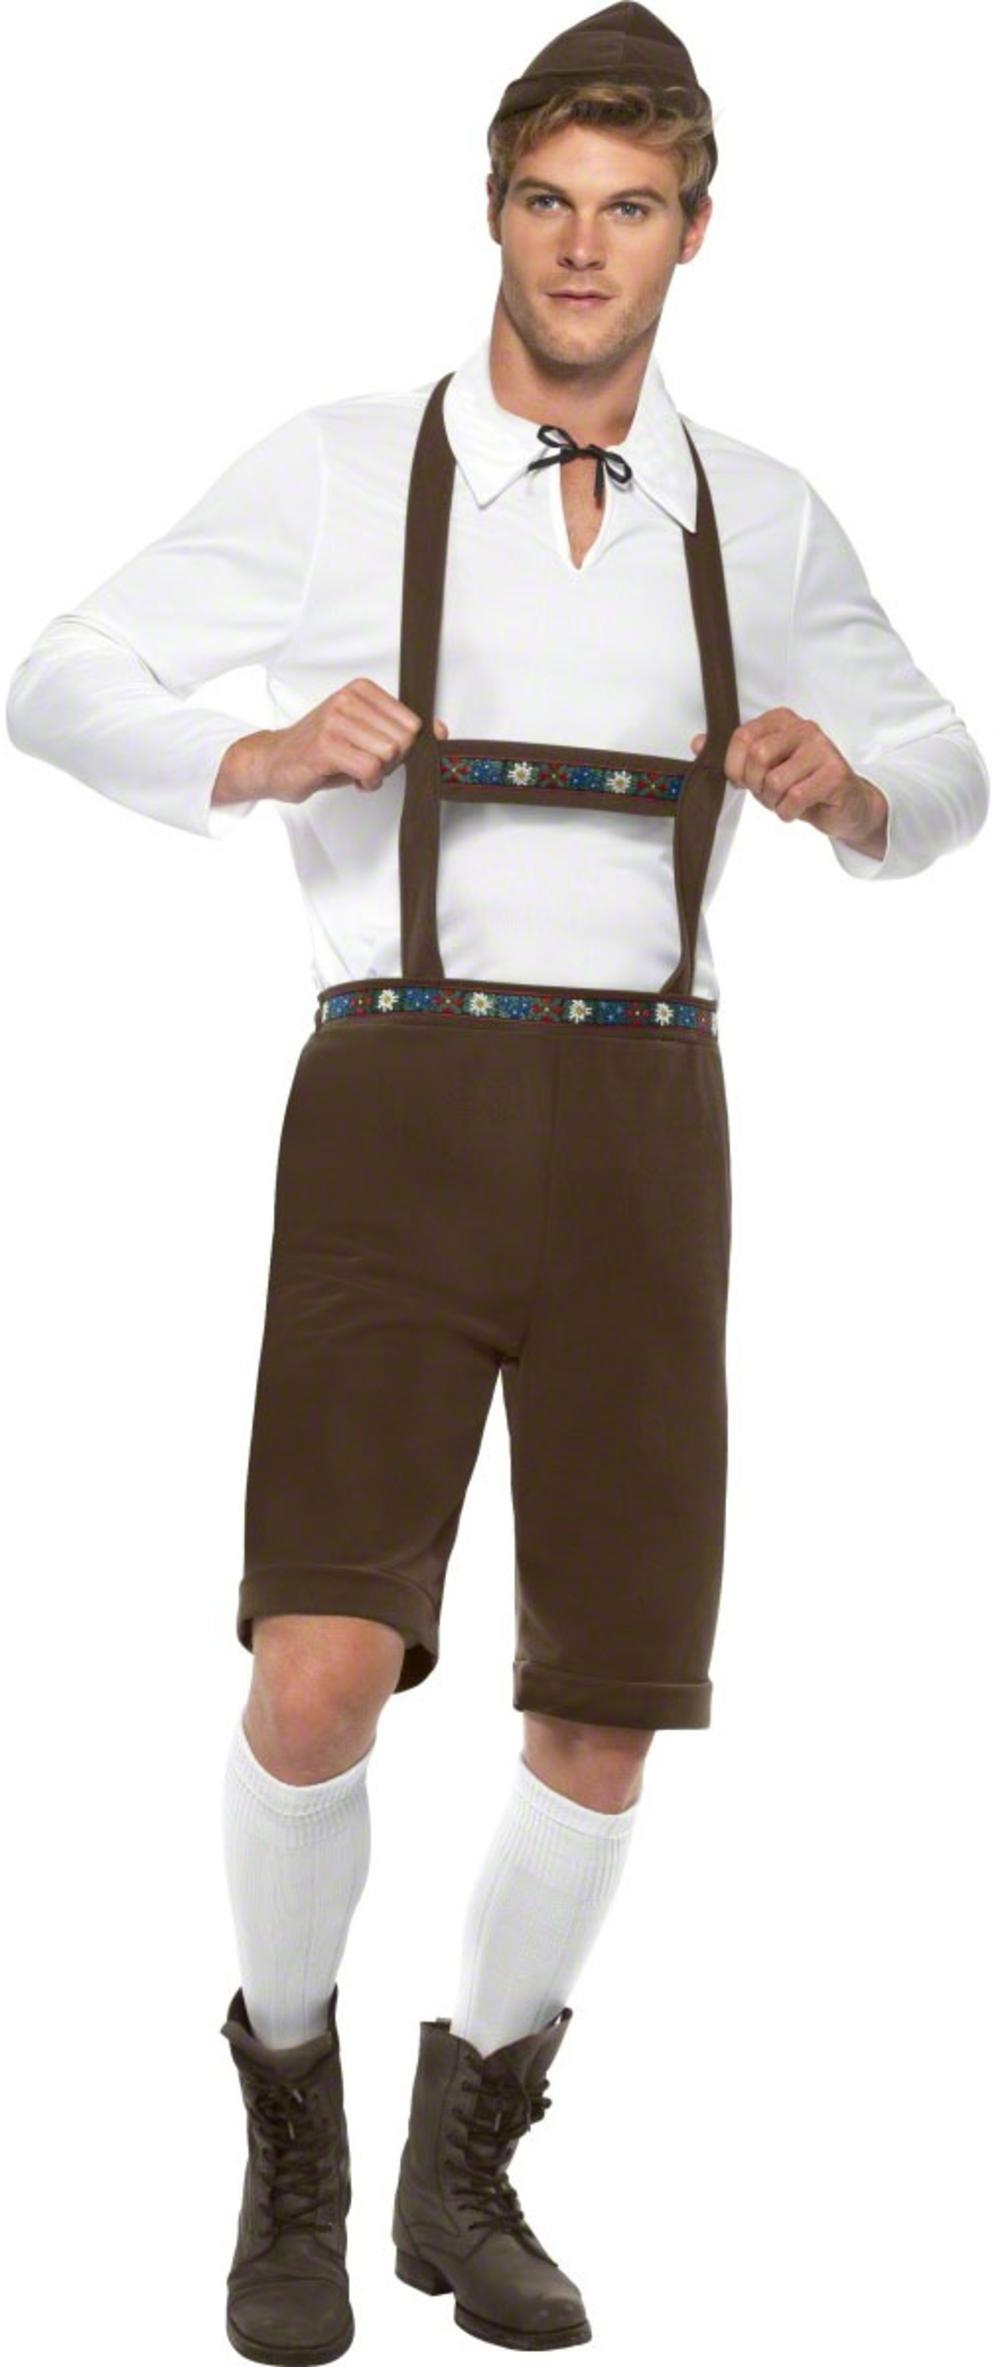 Bavarian Beer Man Oktoberfest Fancy Dress Mens National Dress Costume Outfit New